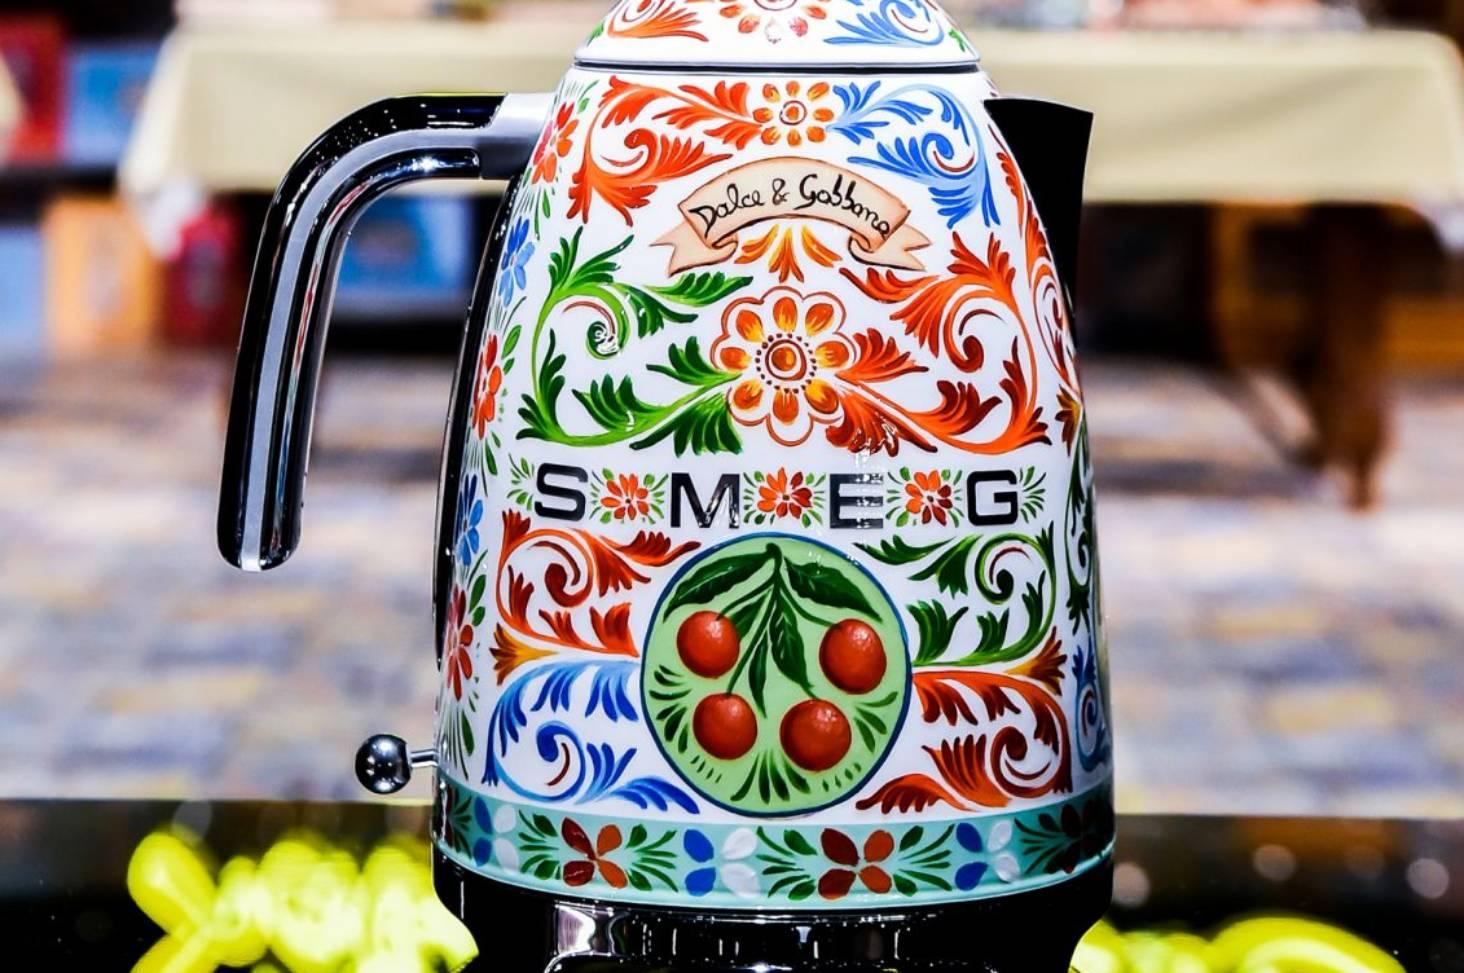 64c0e1167e2 Dolce   Gabbana design over the top appliances for your kitchen ...